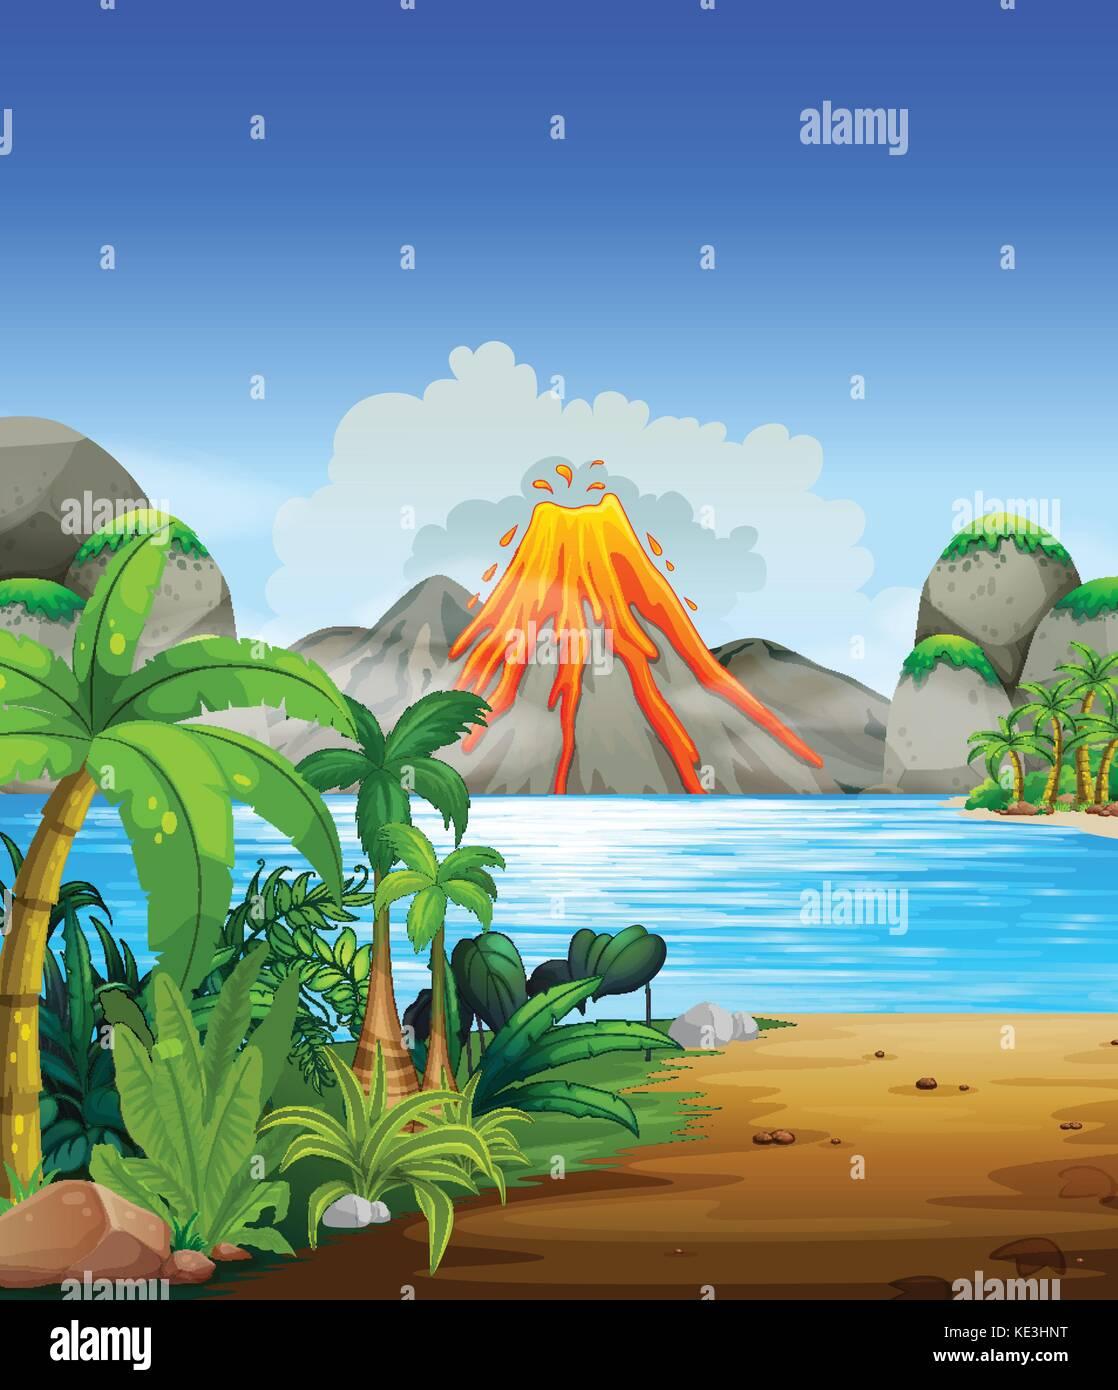 Volcano eruption behind the lake illustration - Stock Vector